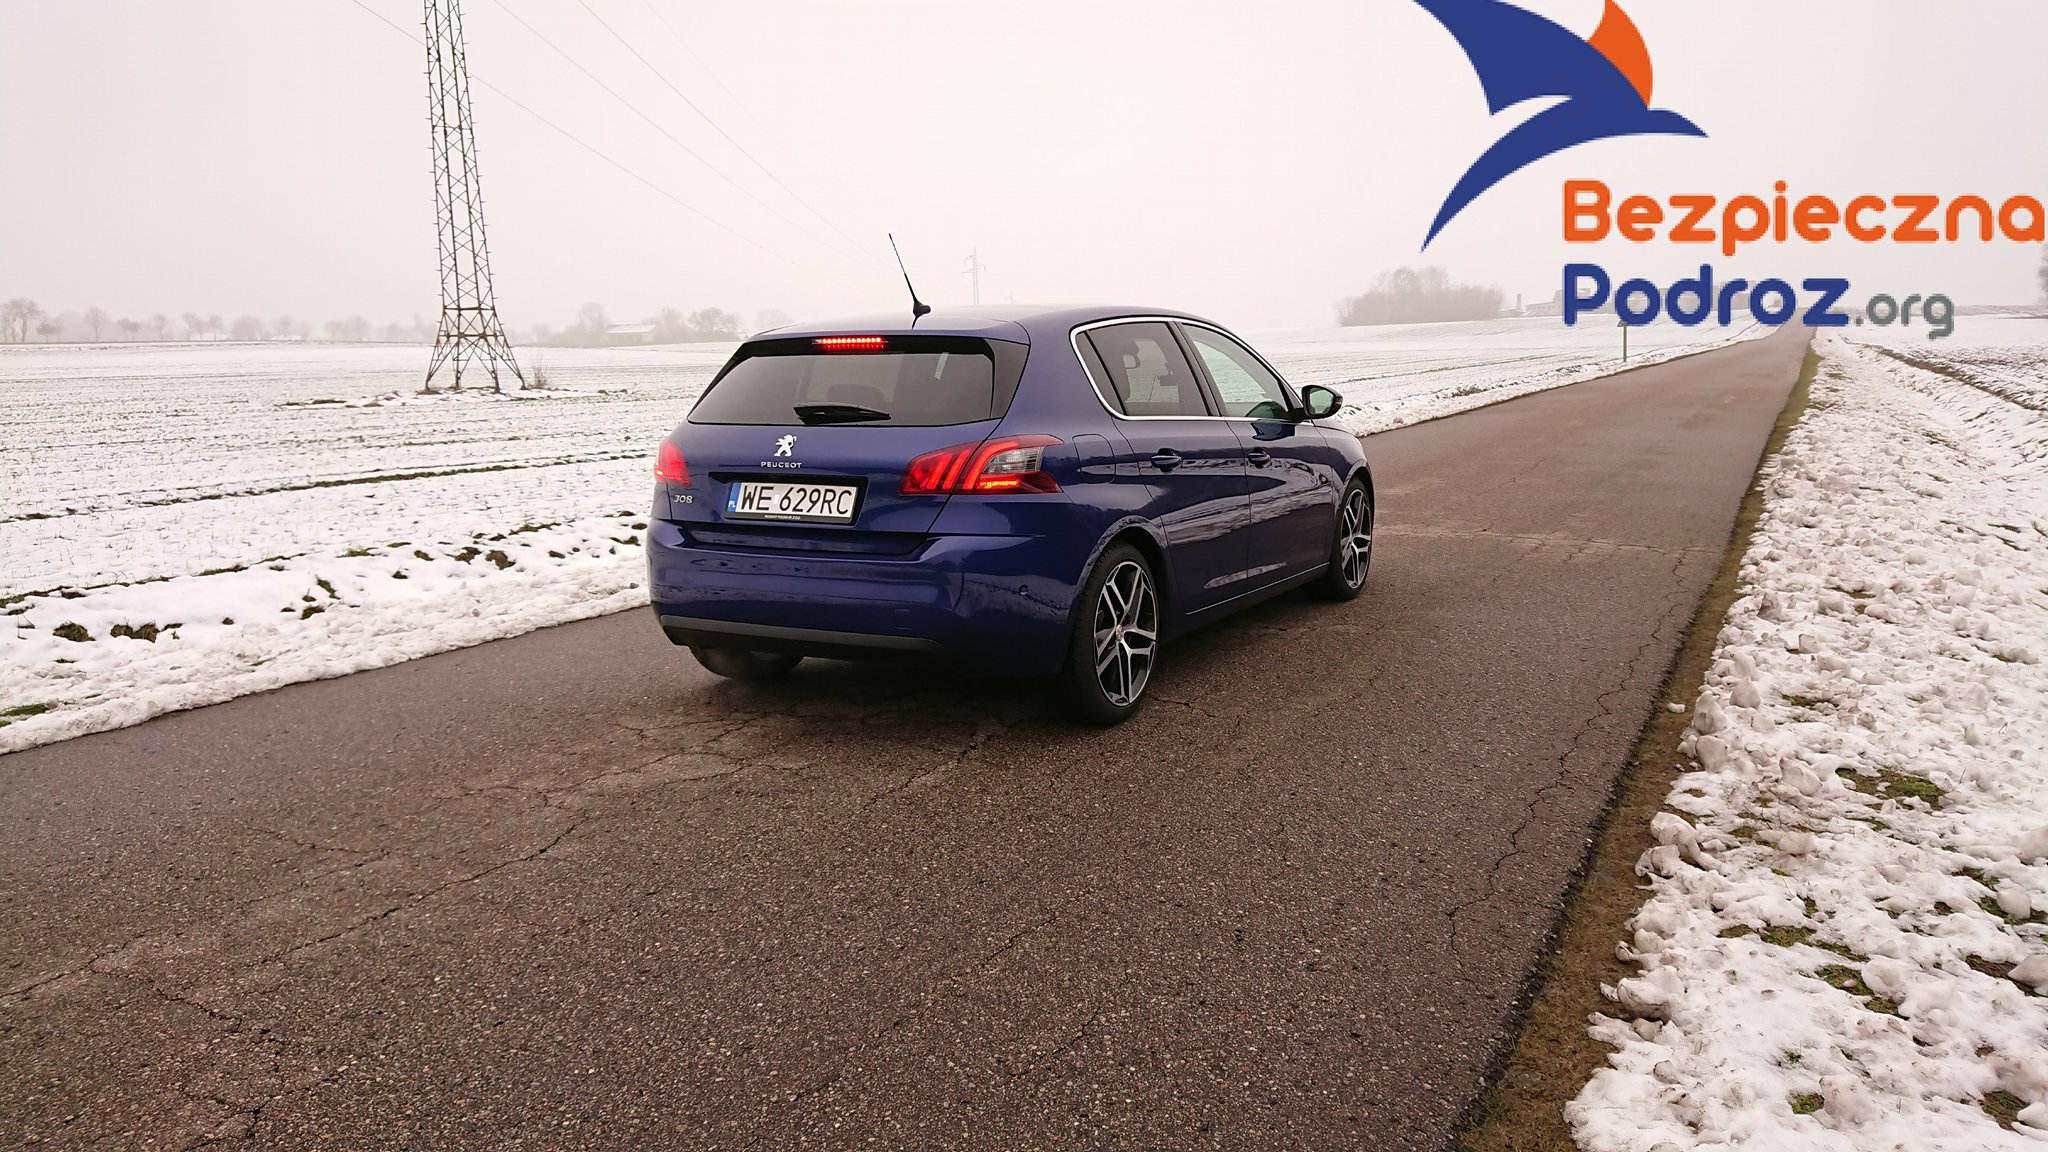 Peugeot 308 PureTech 130 EAT6 i wideorejestrator Mio MiVue 786 wifi